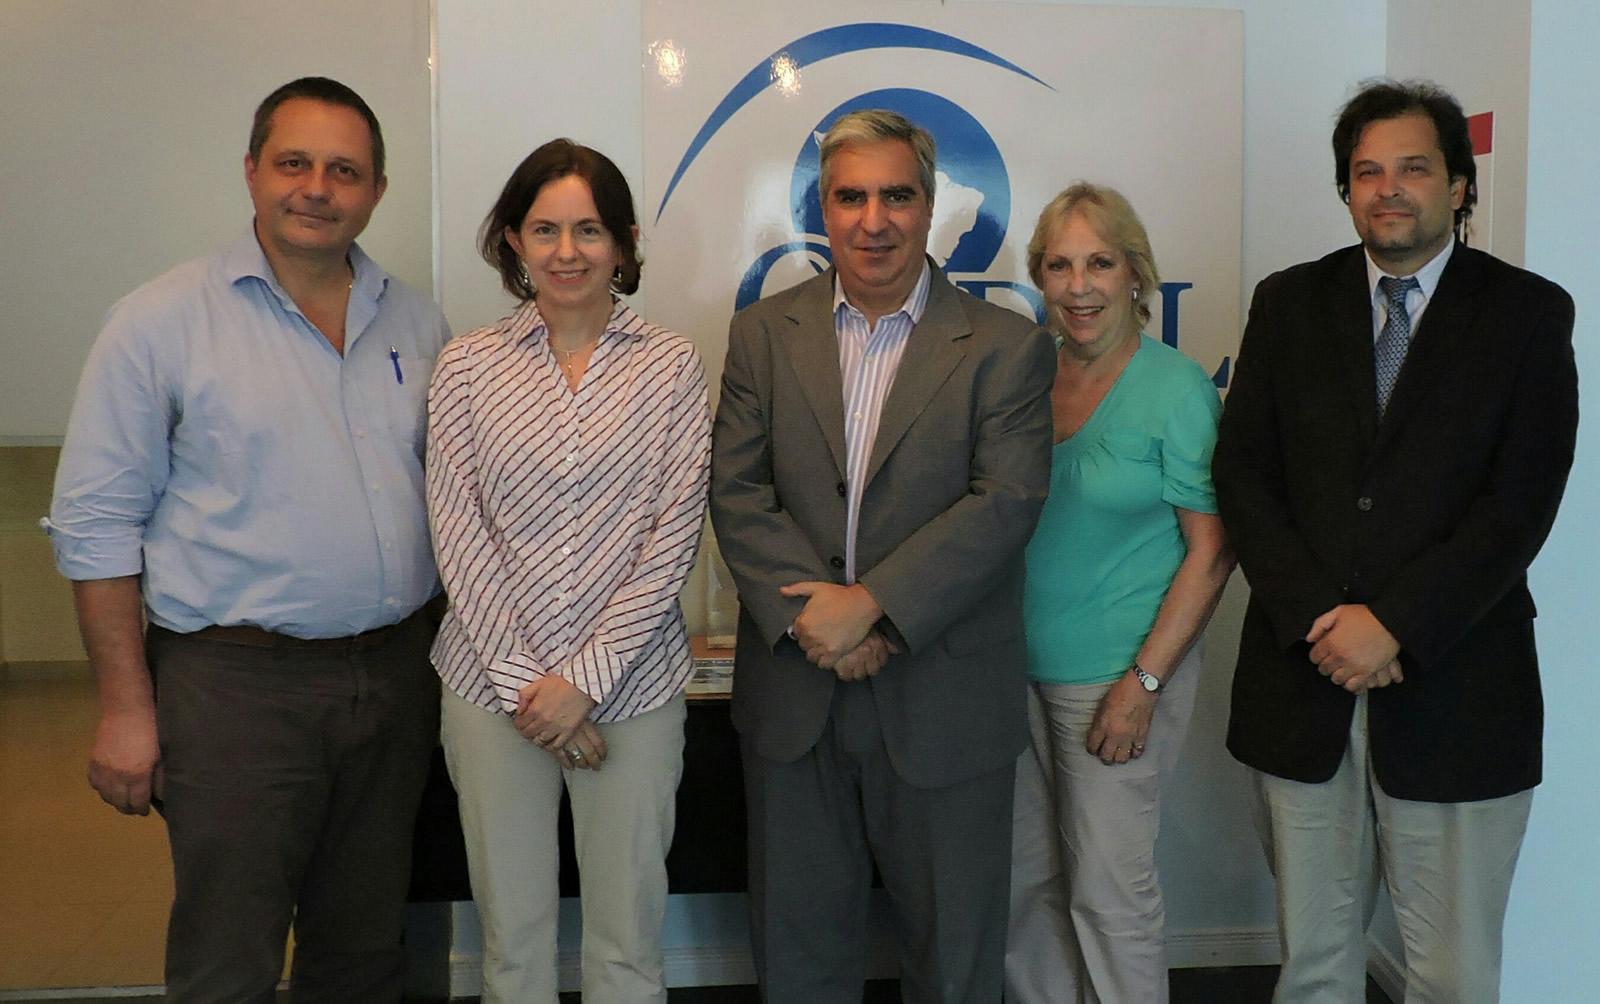 Tristán Rodríguez Loredo, Sybil Rhodes, Gabriel C. Salvia, María Teresa Reviriego y Bernabé García Hamilton